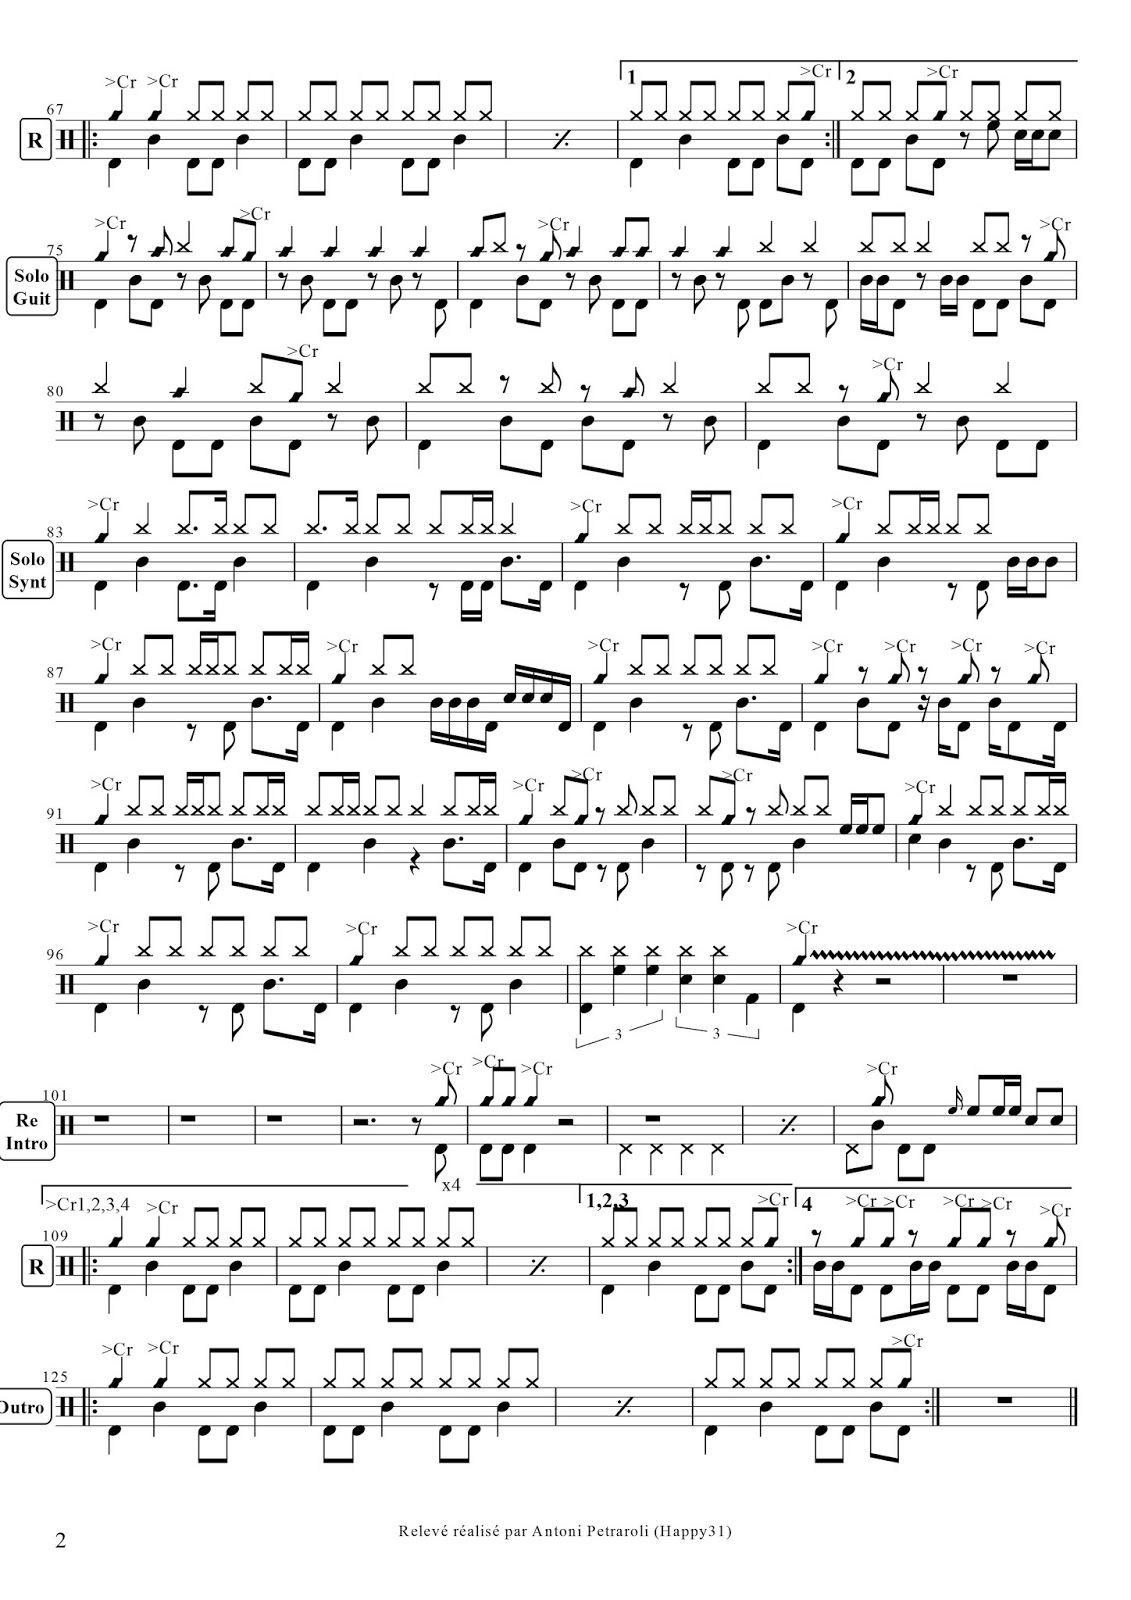 Van Halen Jump 2 Jpg 1131 1600 Drum Sheet Music Drums Sheet Drum Notes